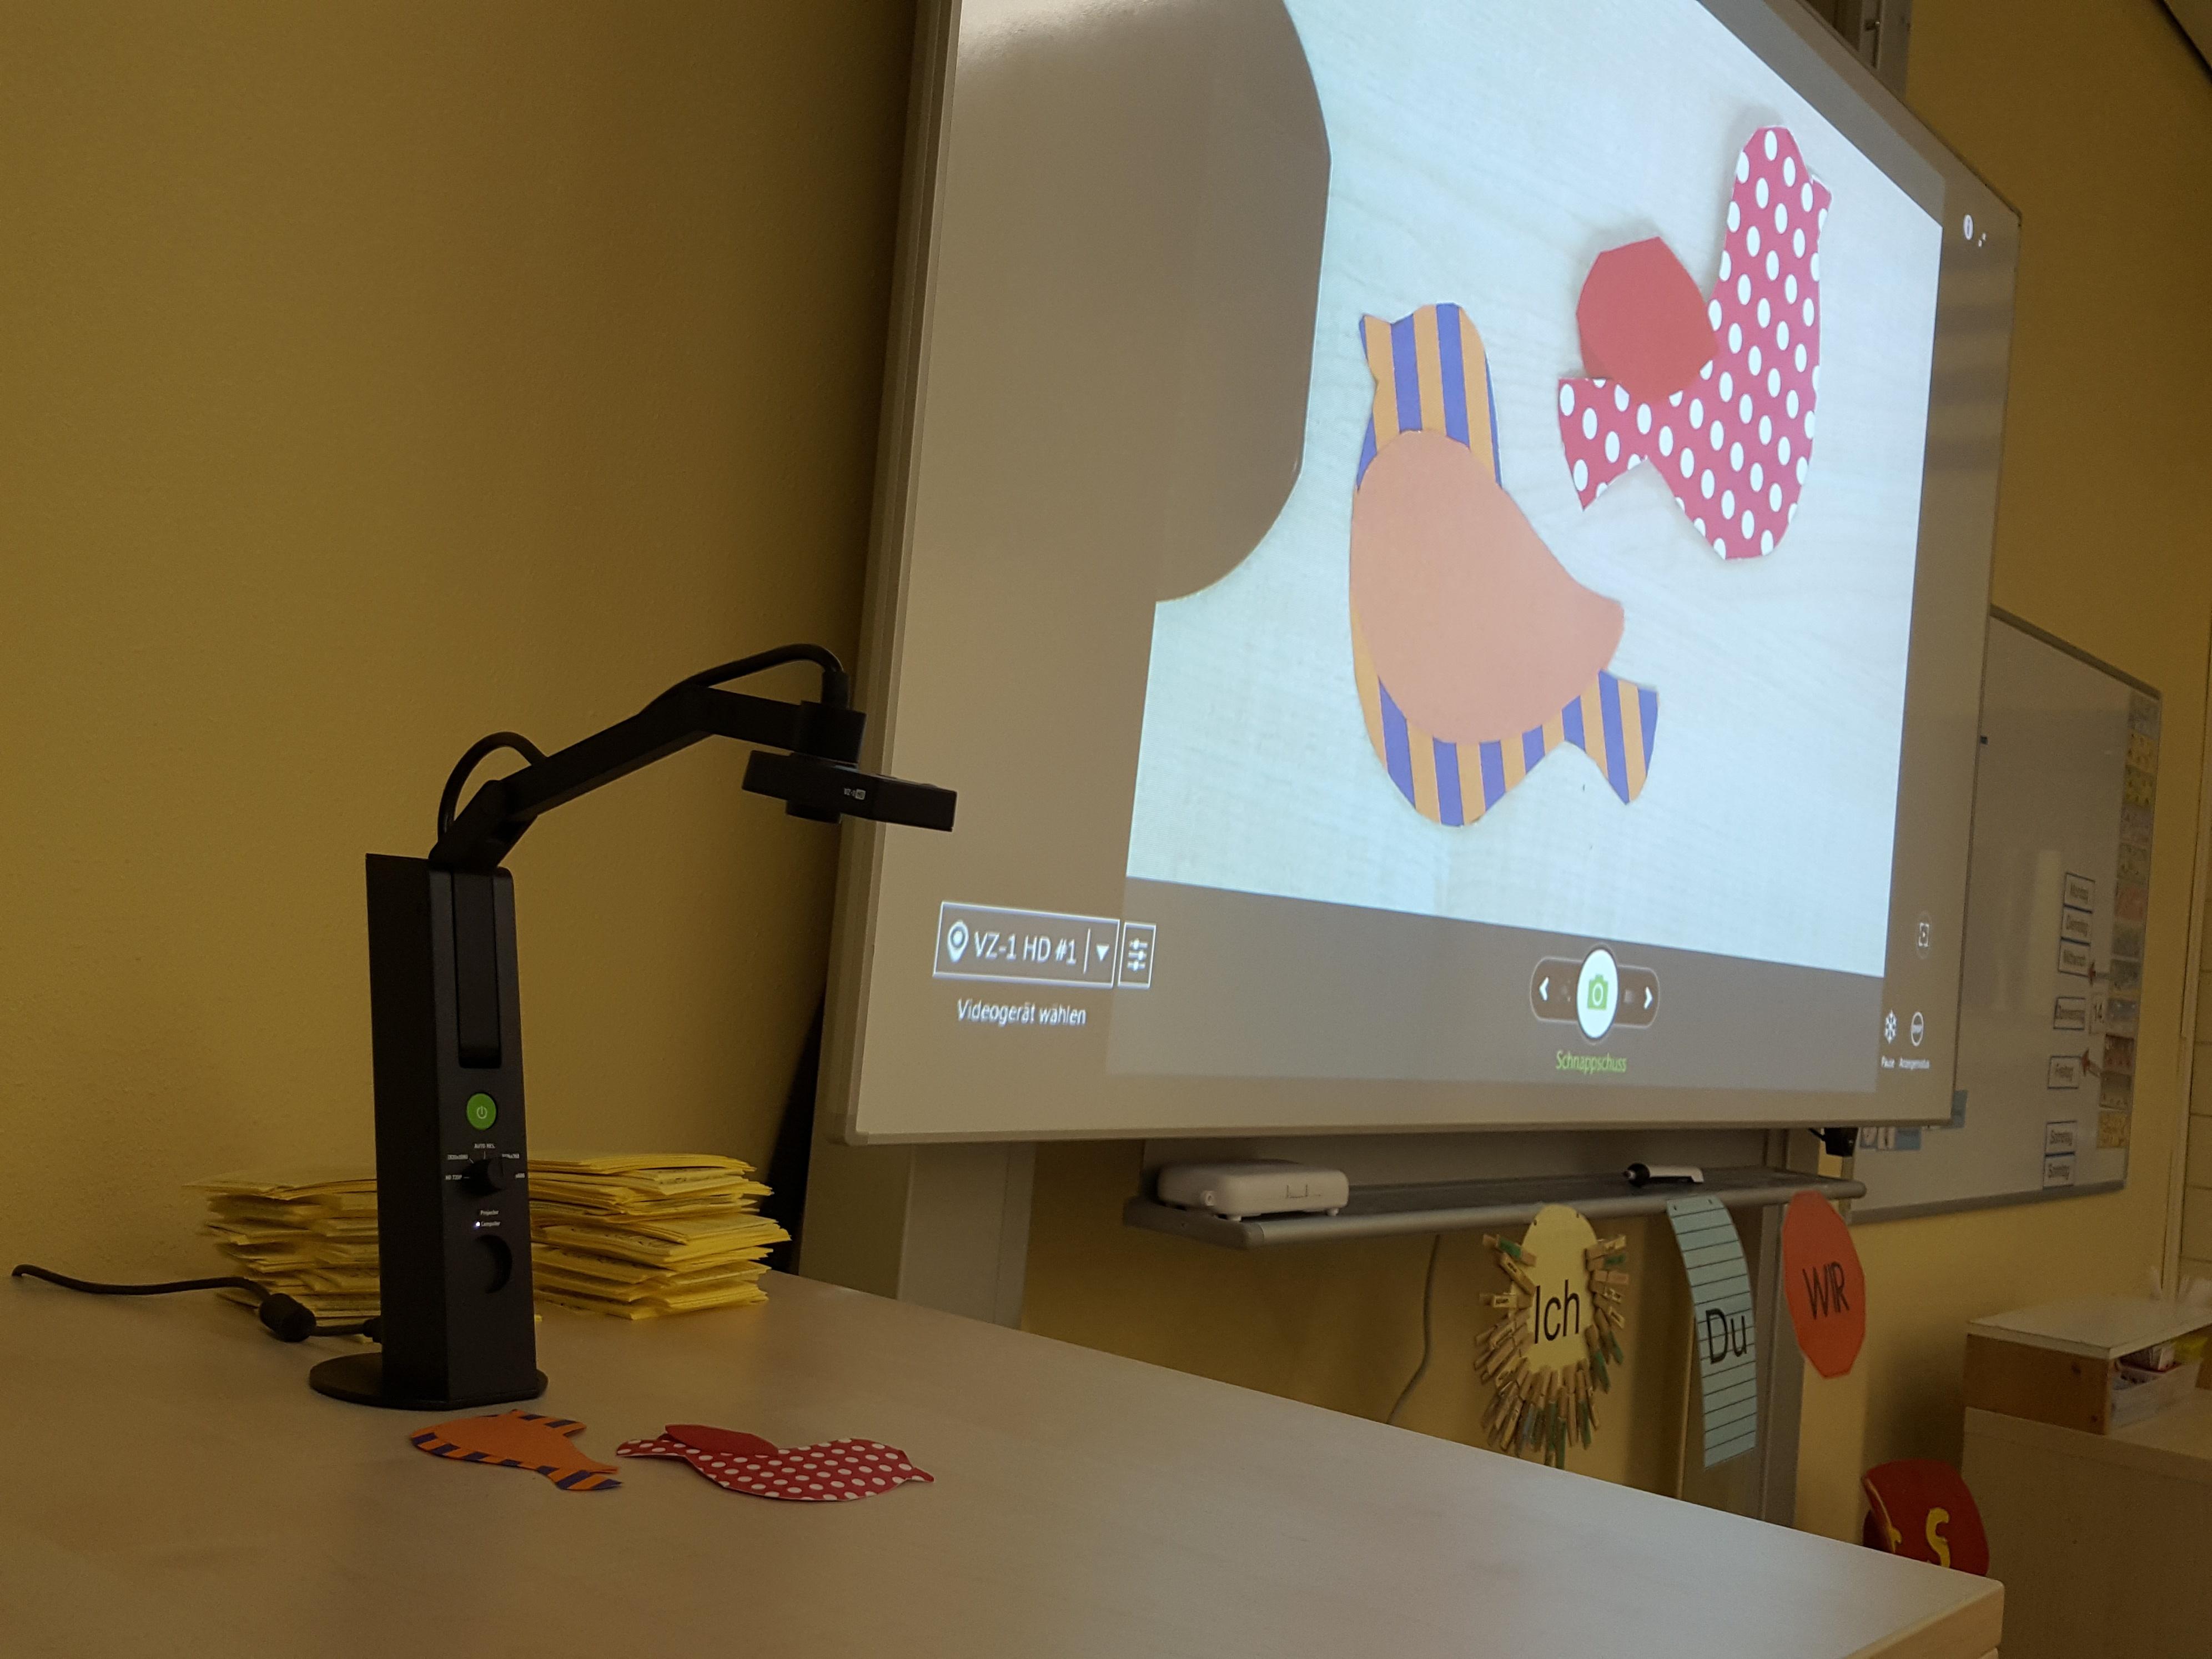 Kamera für die Whiteboards - Petrus-Canisius-Schule